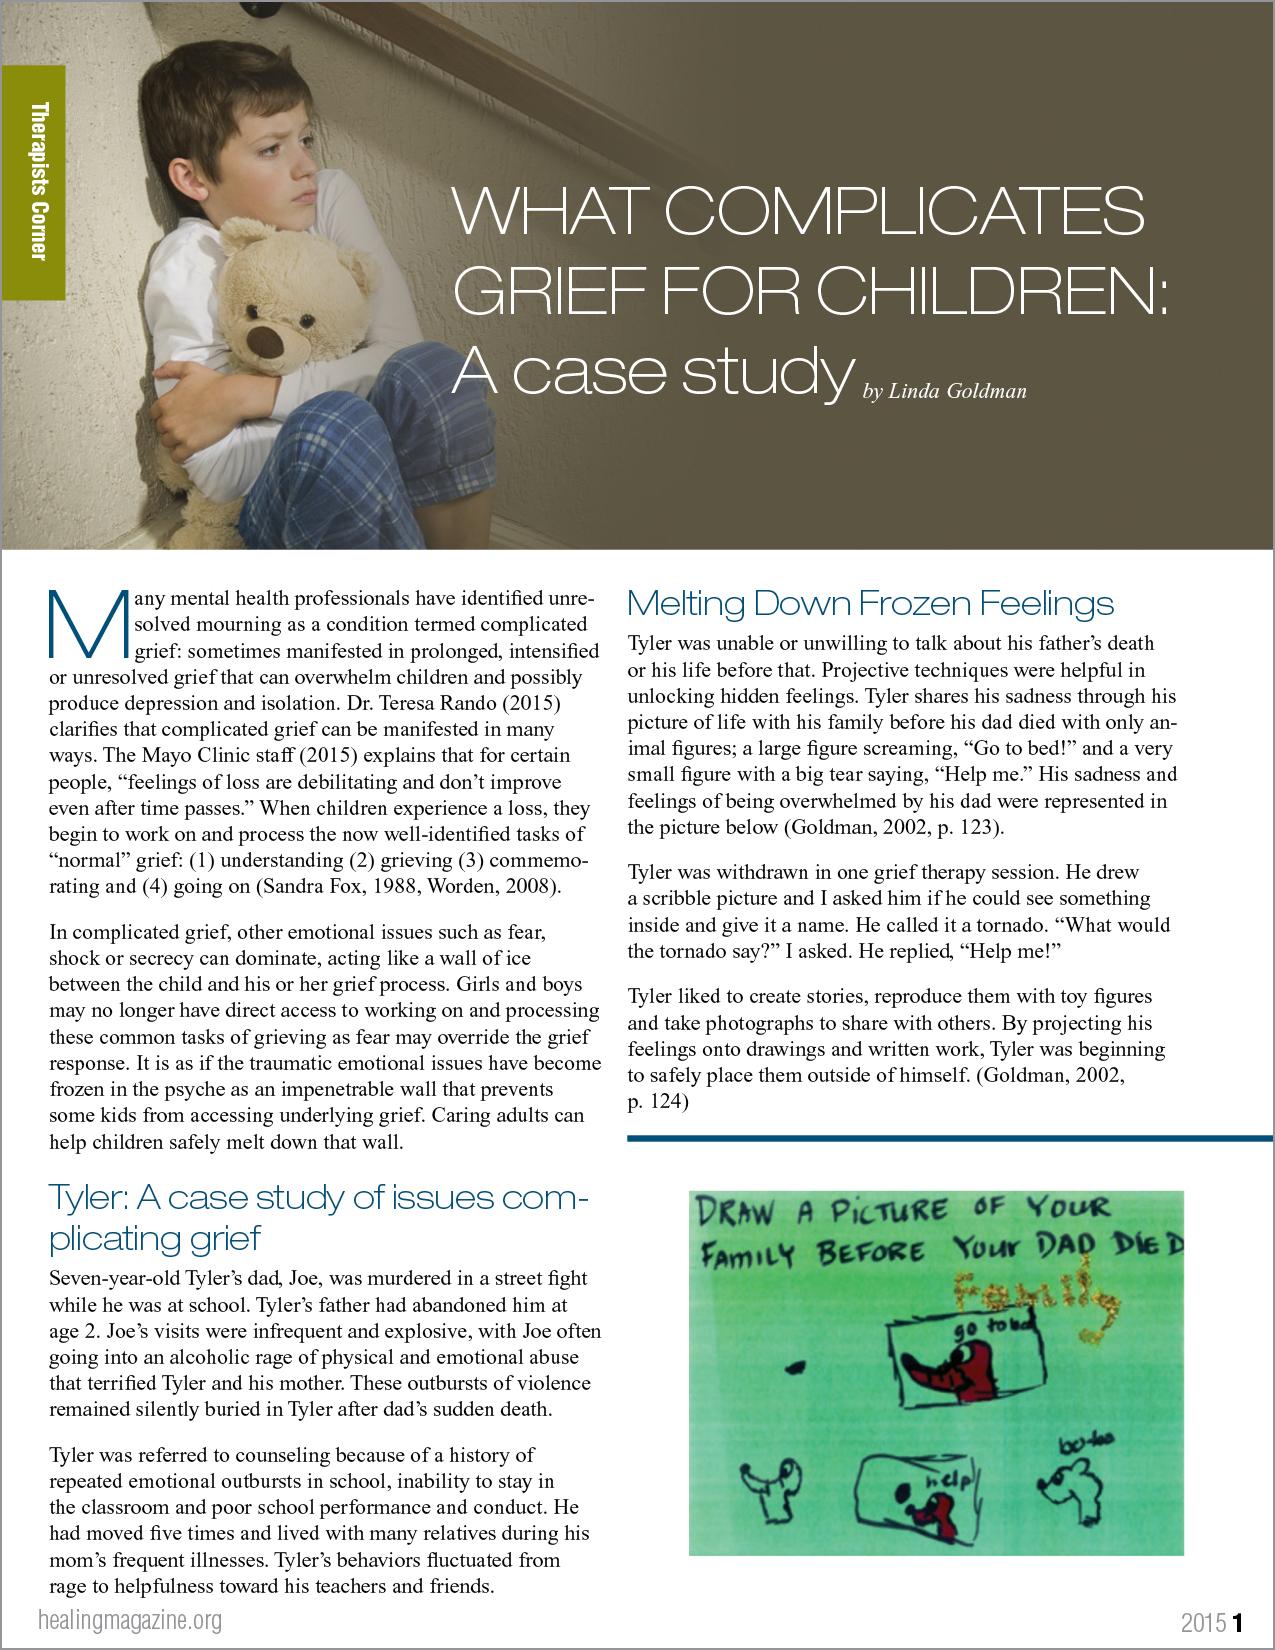 Life-and-Loss-by-Linda-Goldman-Child-Grieving-Therapist-MD-Washington-DC.jpg